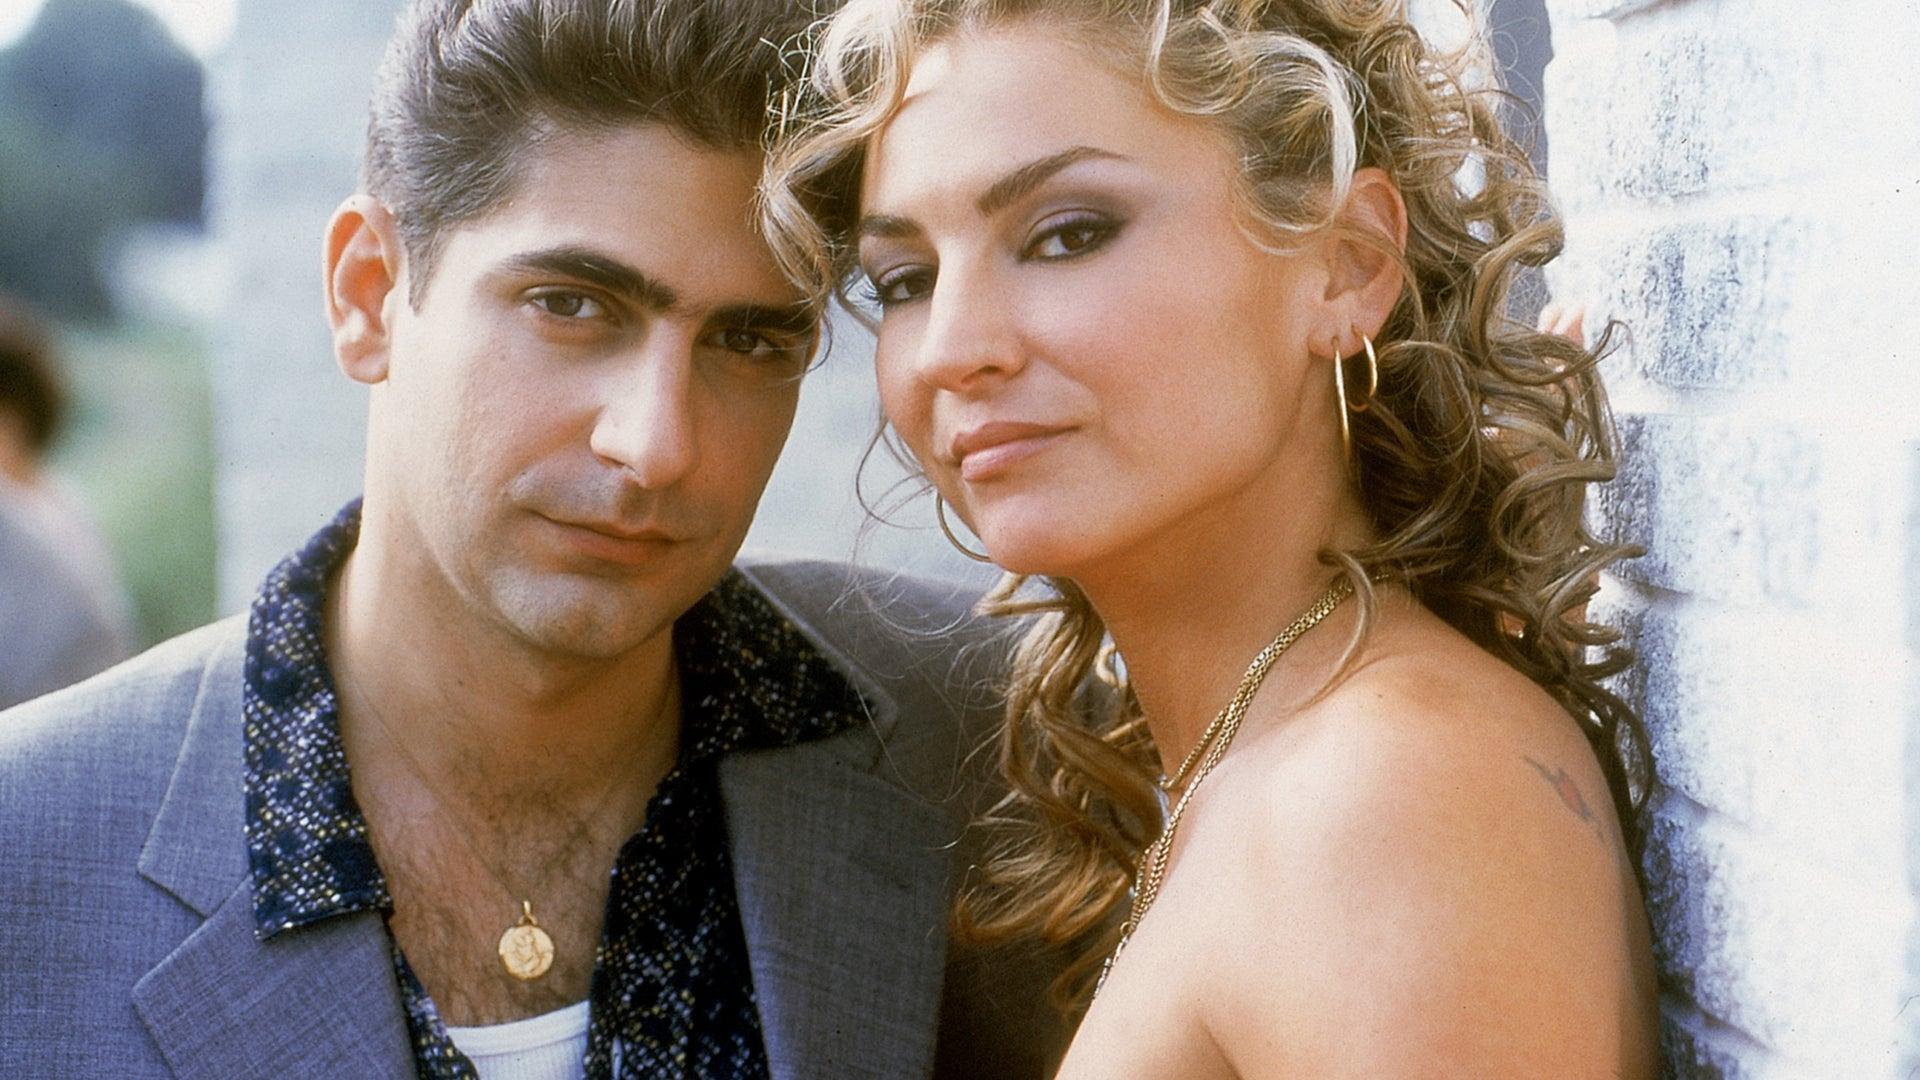 The Sopranos stars now